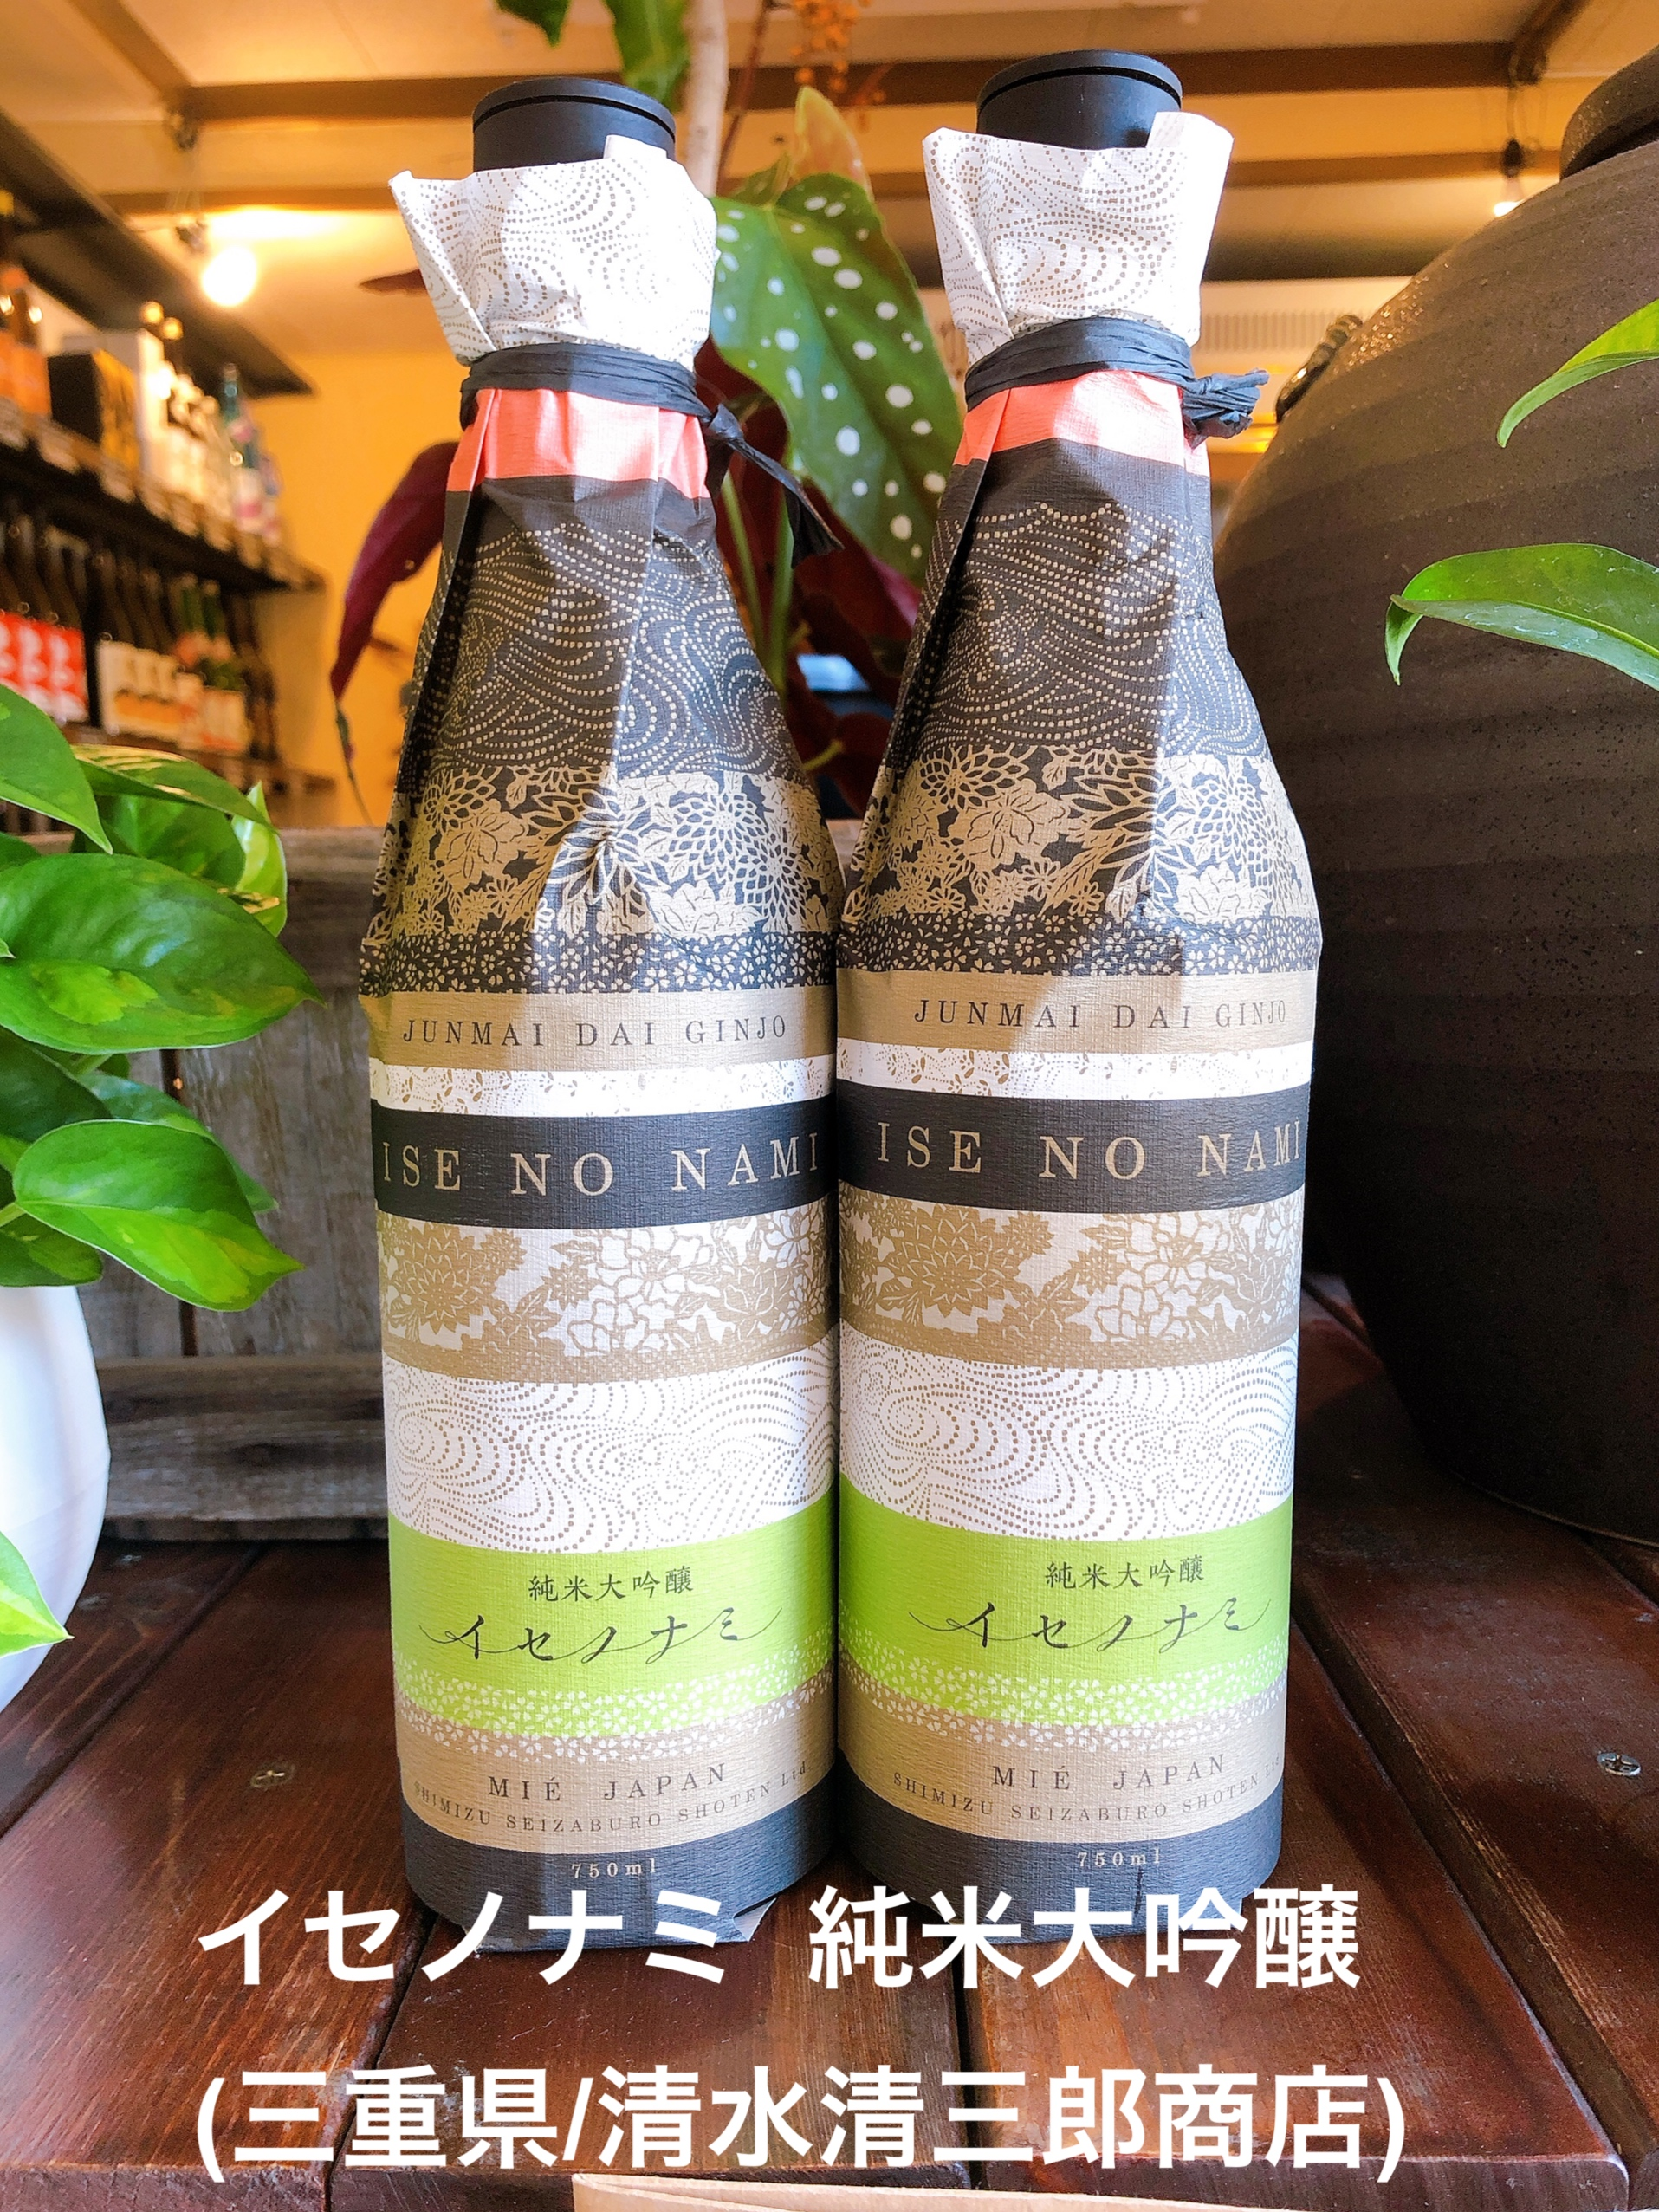 イセノナミ 純米大吟醸(三重県/清水清三郎商店)